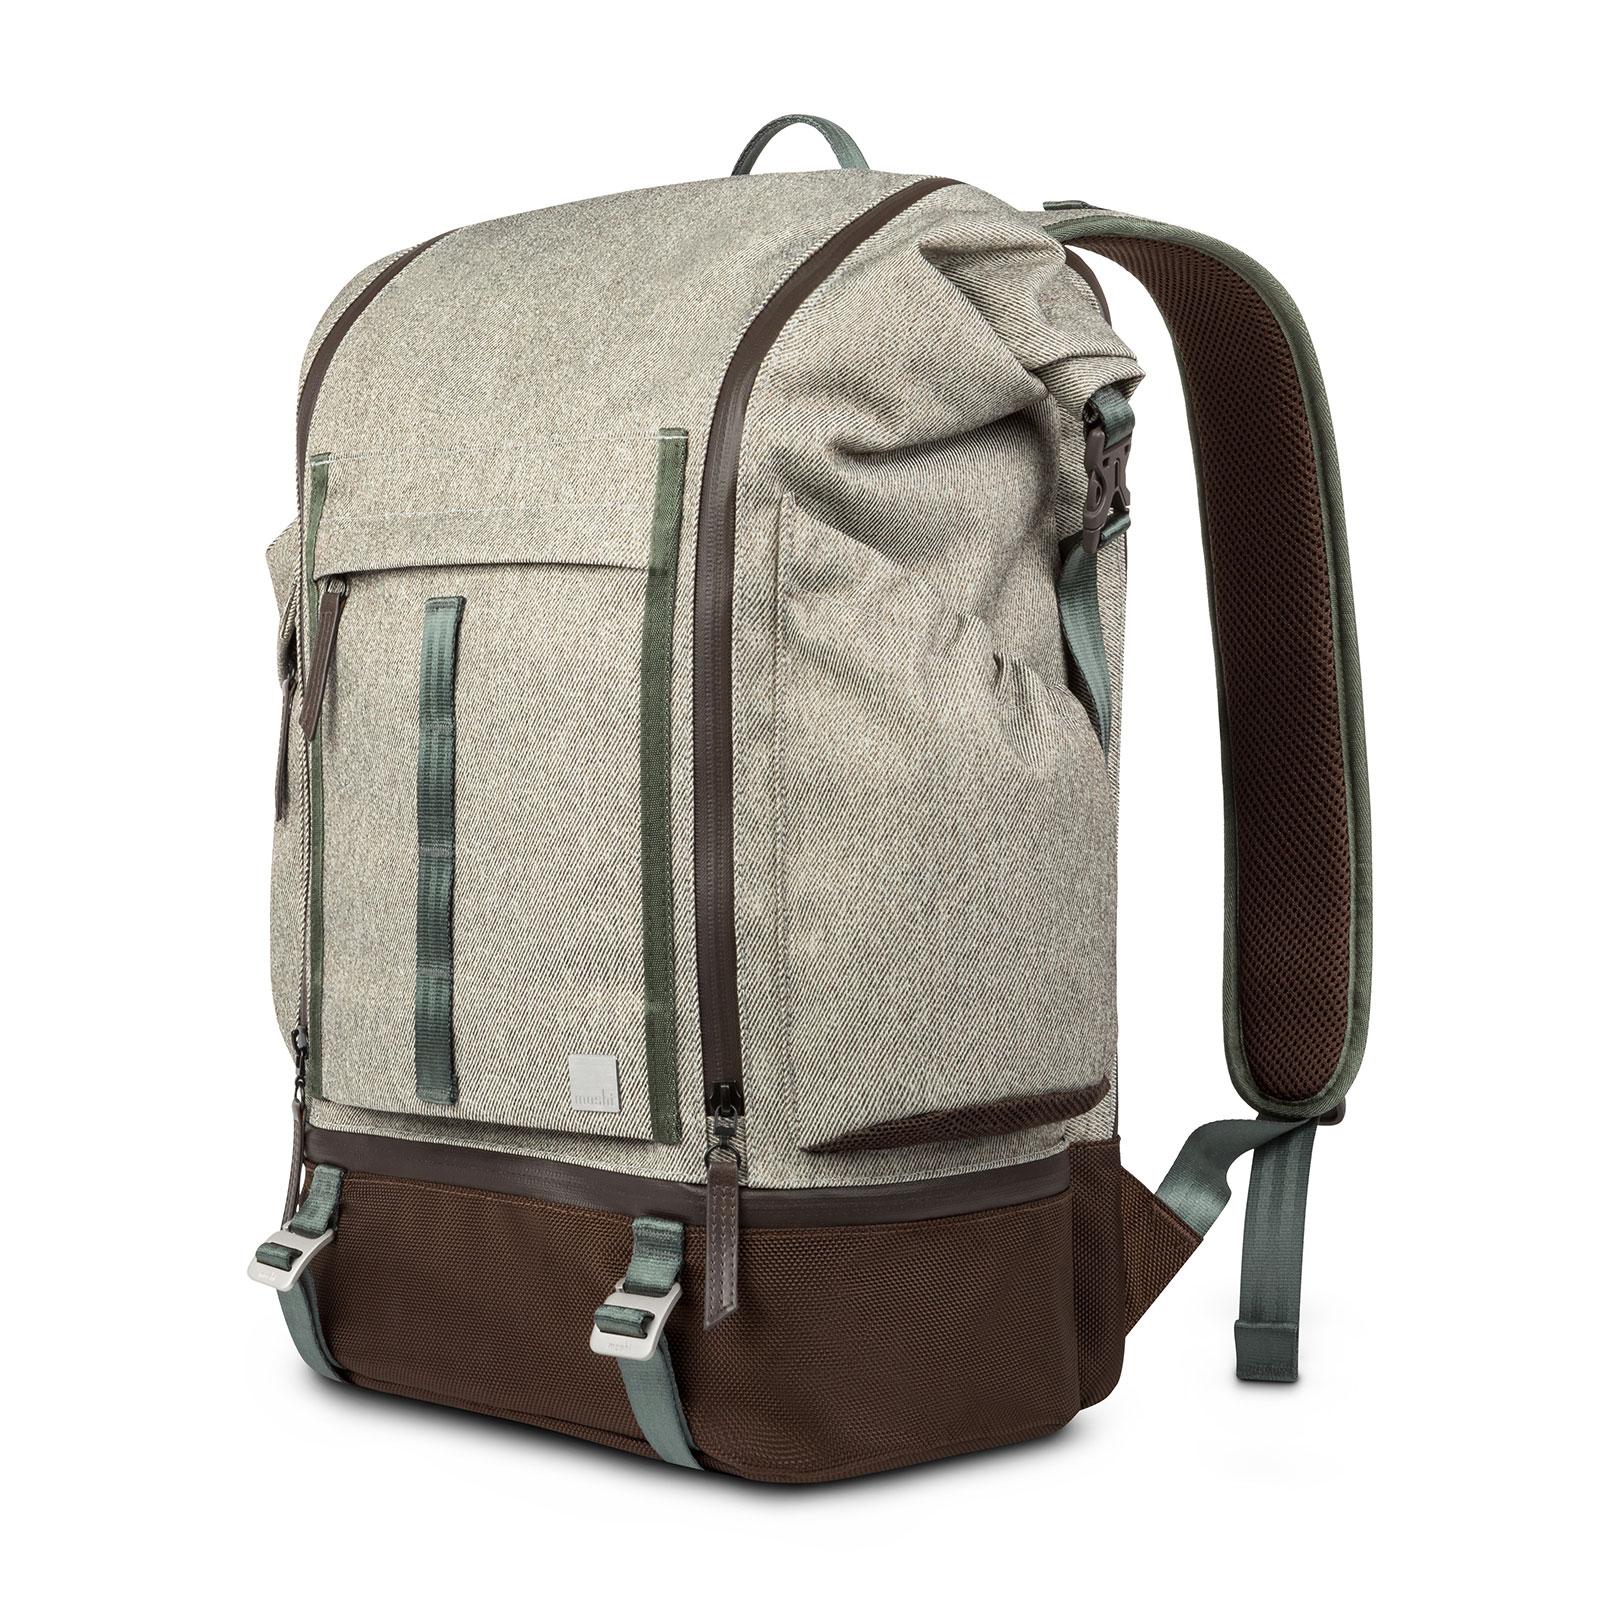 Captus Rolltop Backpack-image